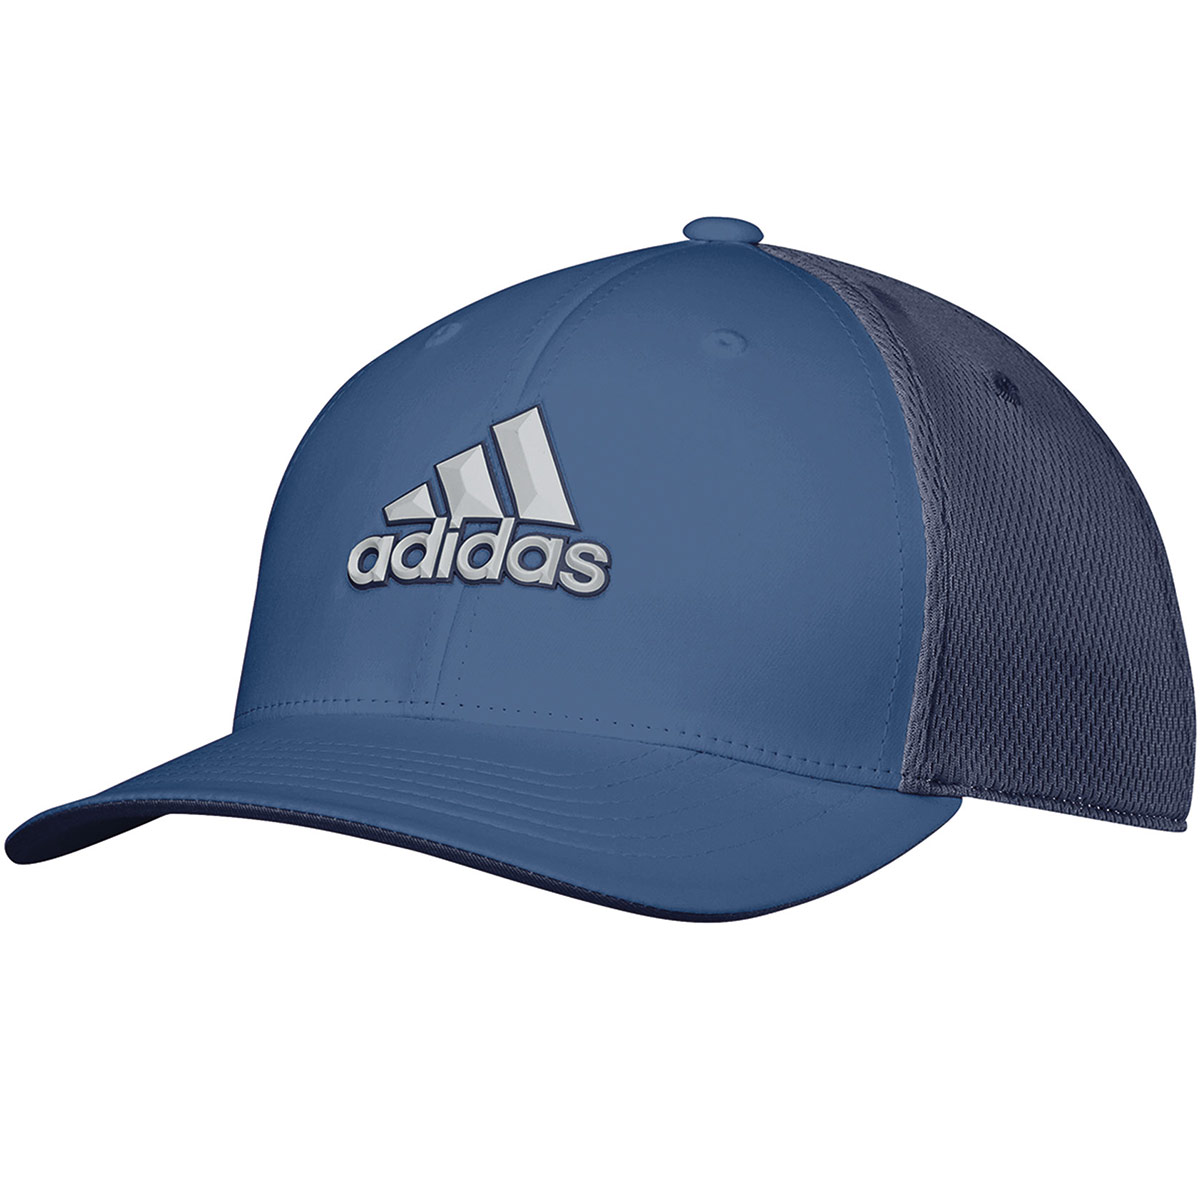 cheap for discount 77921 6e1cf adidas Golf Climacool Tour Cap